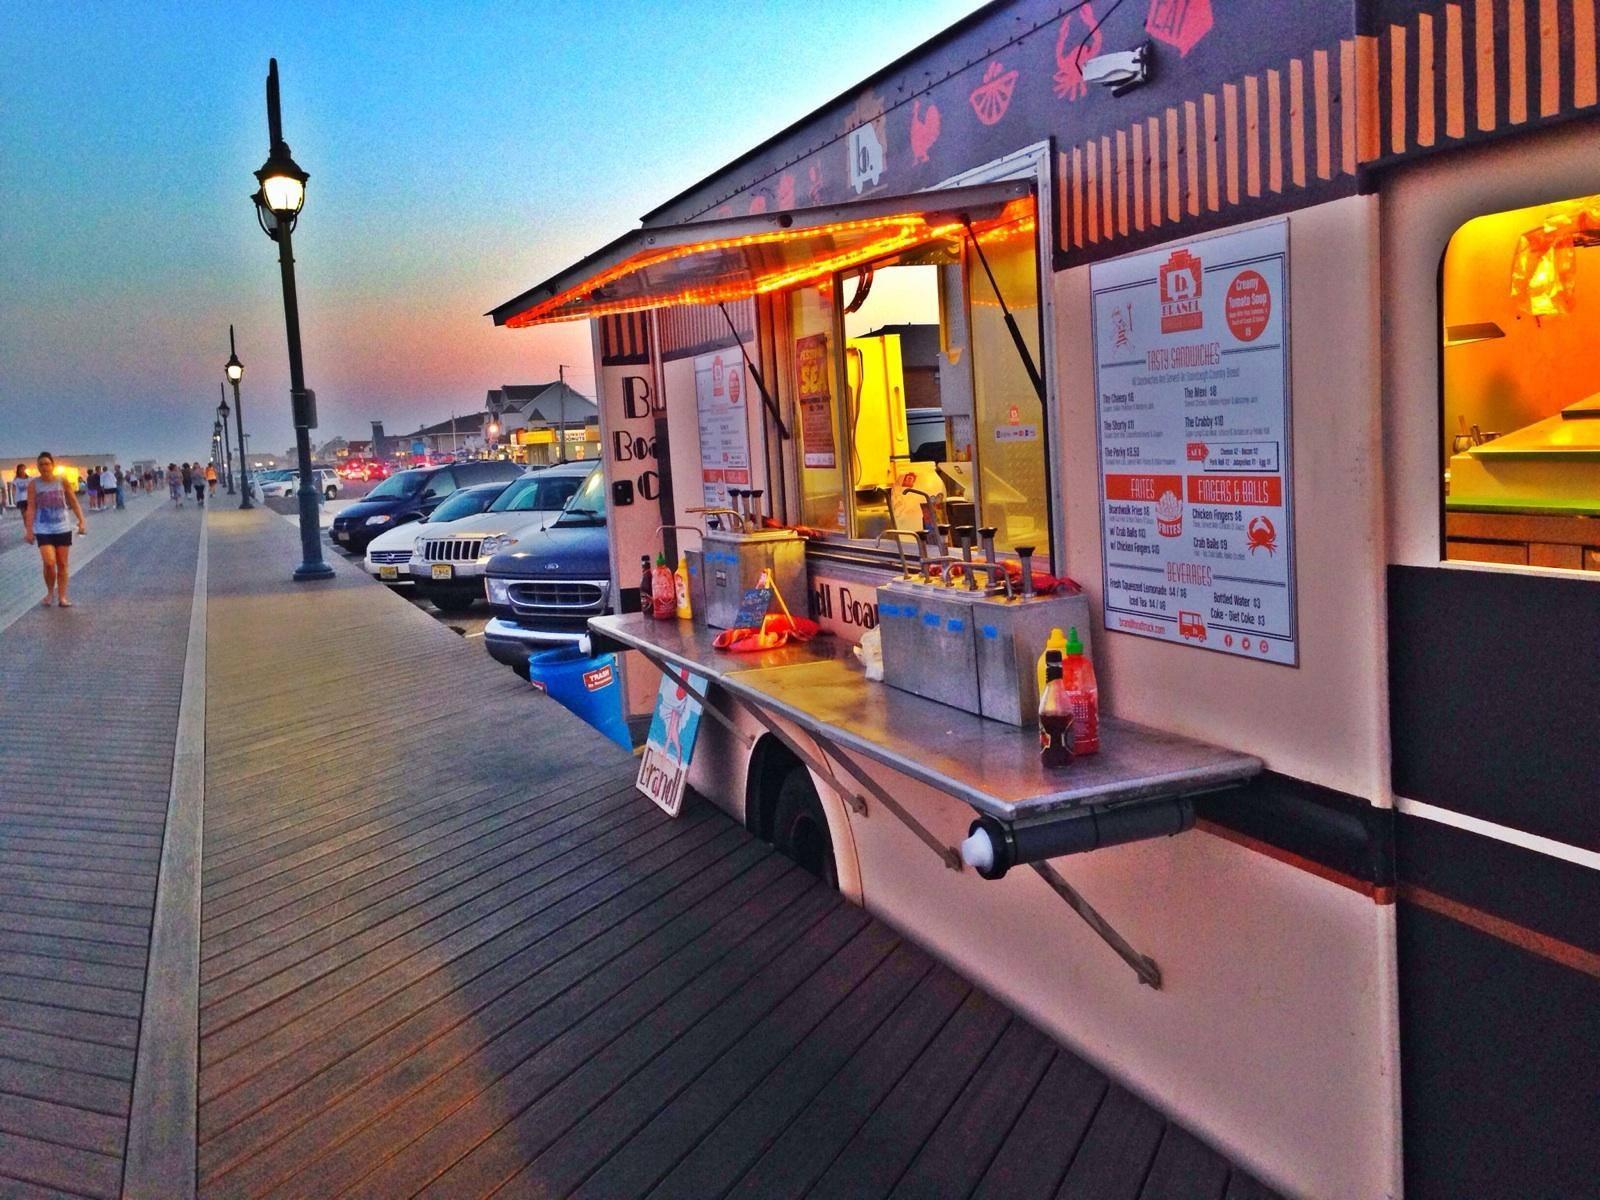 Food Truck Stories with Brandl Boardwalk Cuisine